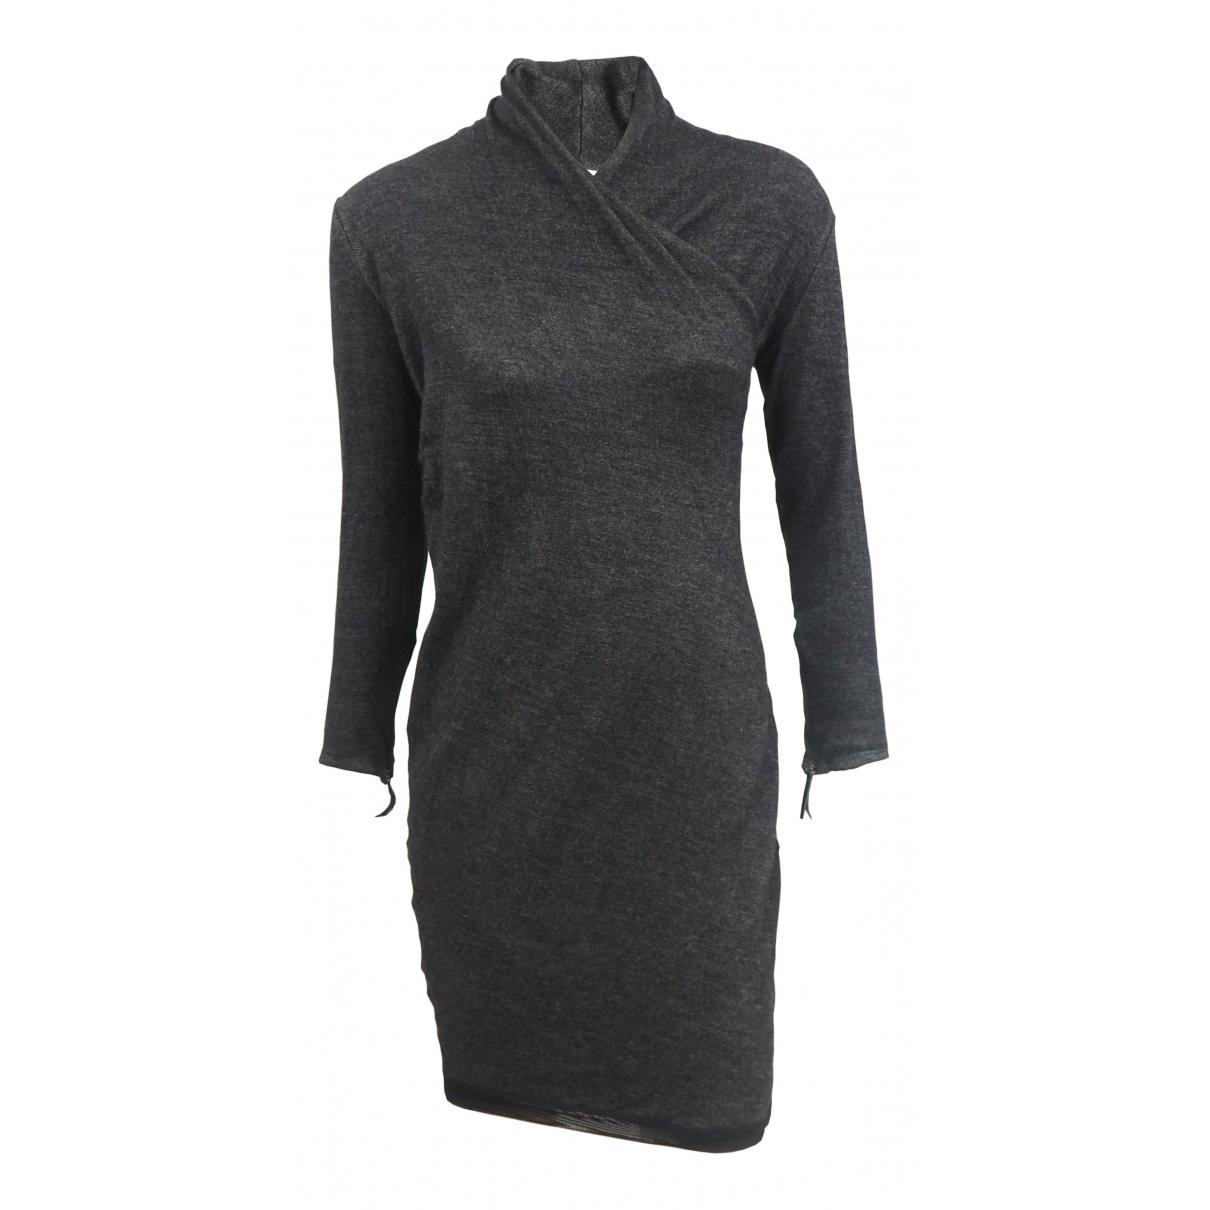 Max Mara \N Grey Wool dress for Women S International